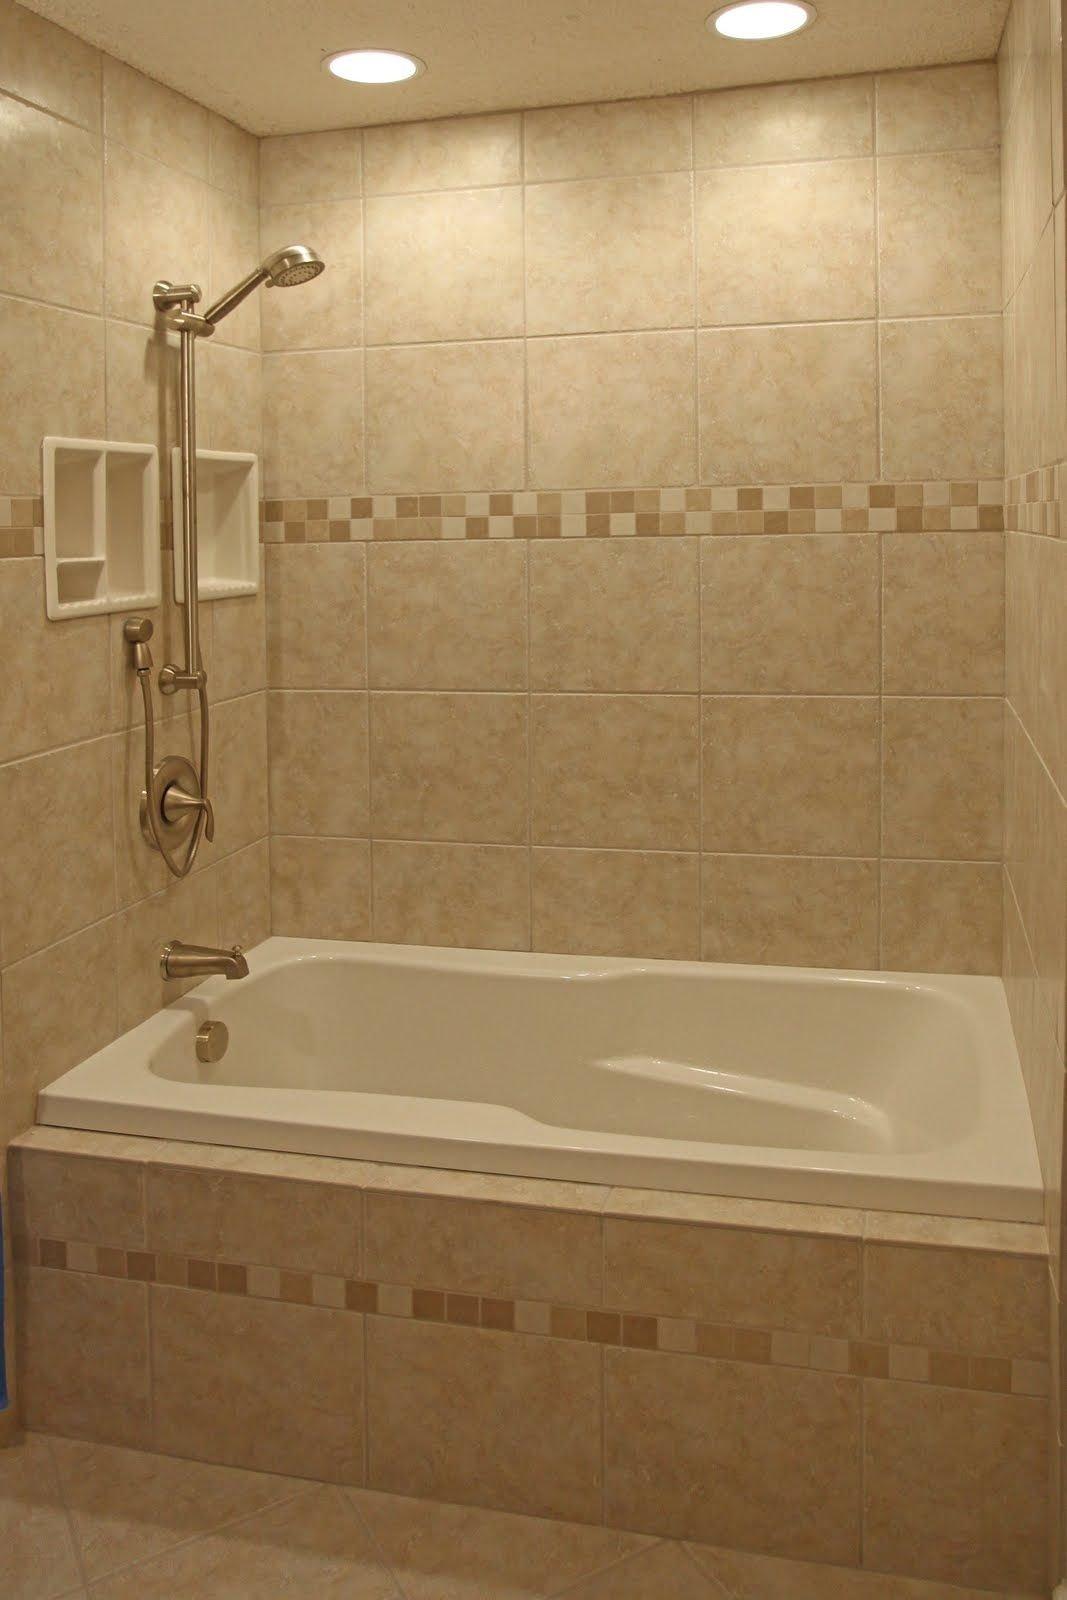 shower and bath remodel | bathroom shower design ideas » ceramic